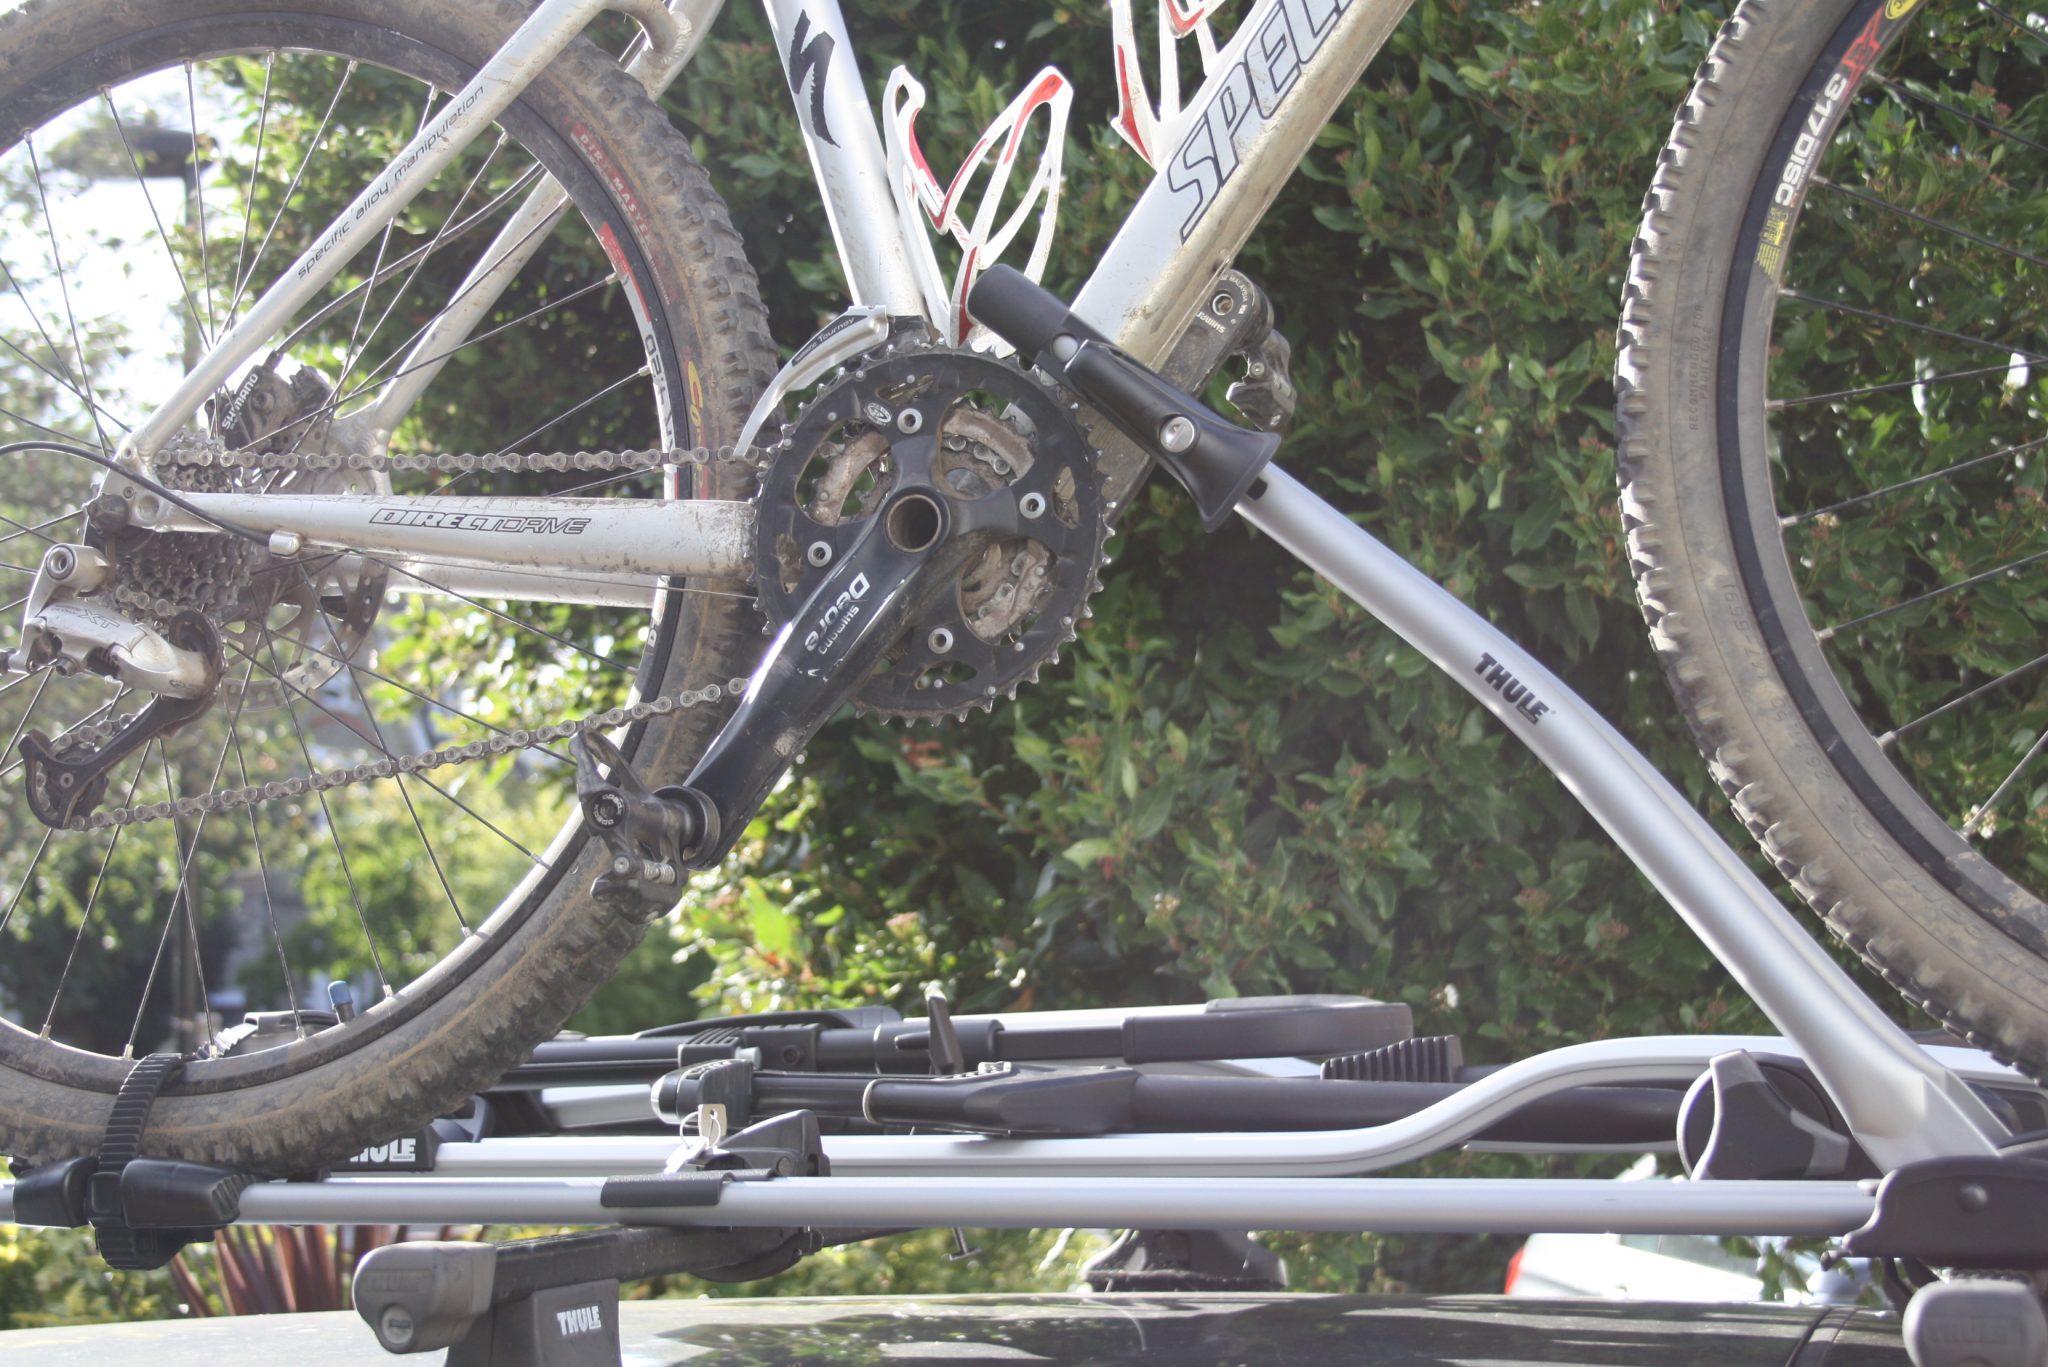 ETC Frame Securing Arms 2 Bike